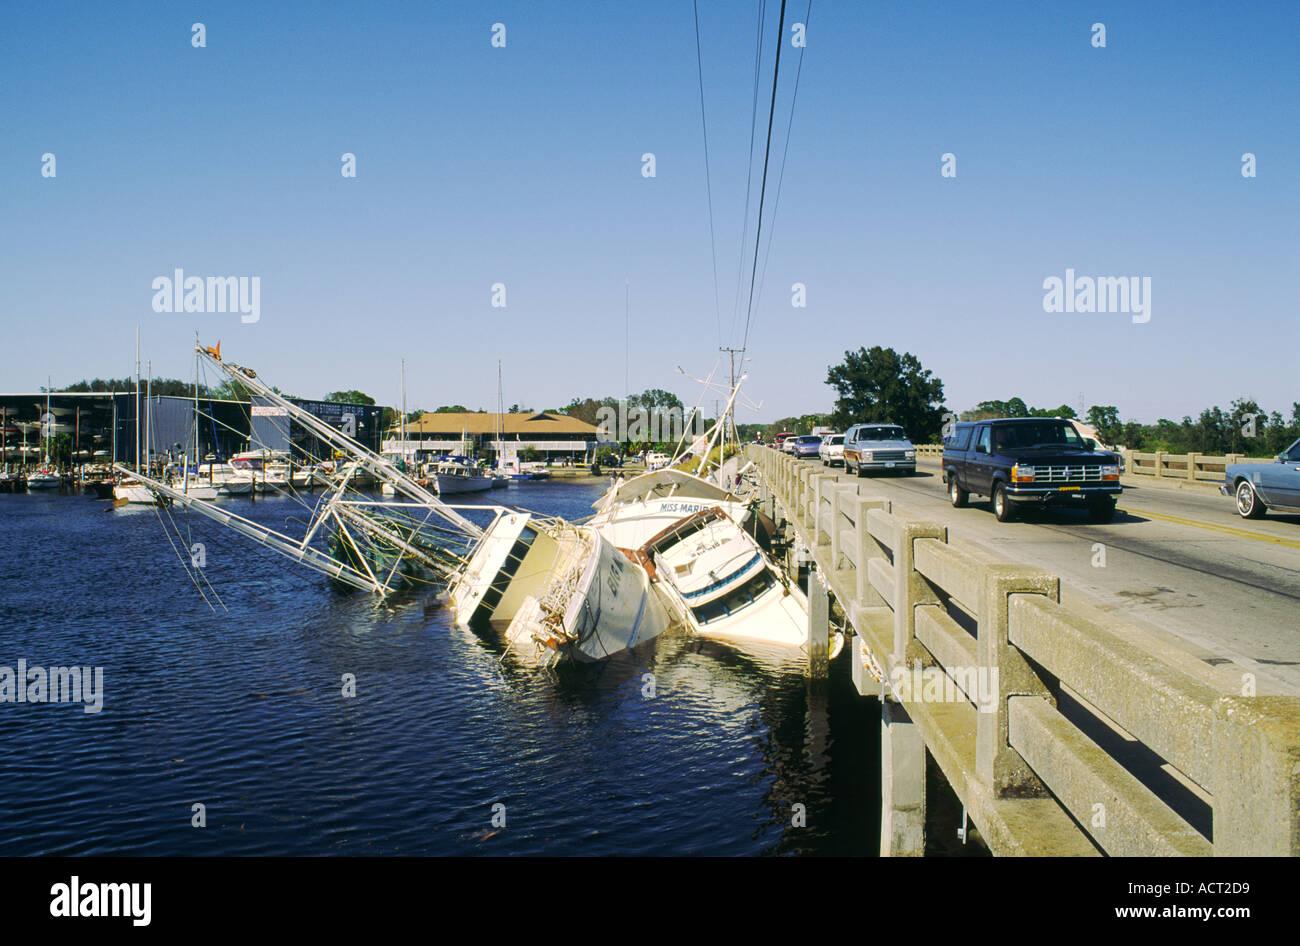 Gulf Coast Sturm Tornado Hurrikan beschädigt Krabbenfischerei und Sportboote in den Sponge Docks, Tarpon Springs, Florida, USA Stockbild